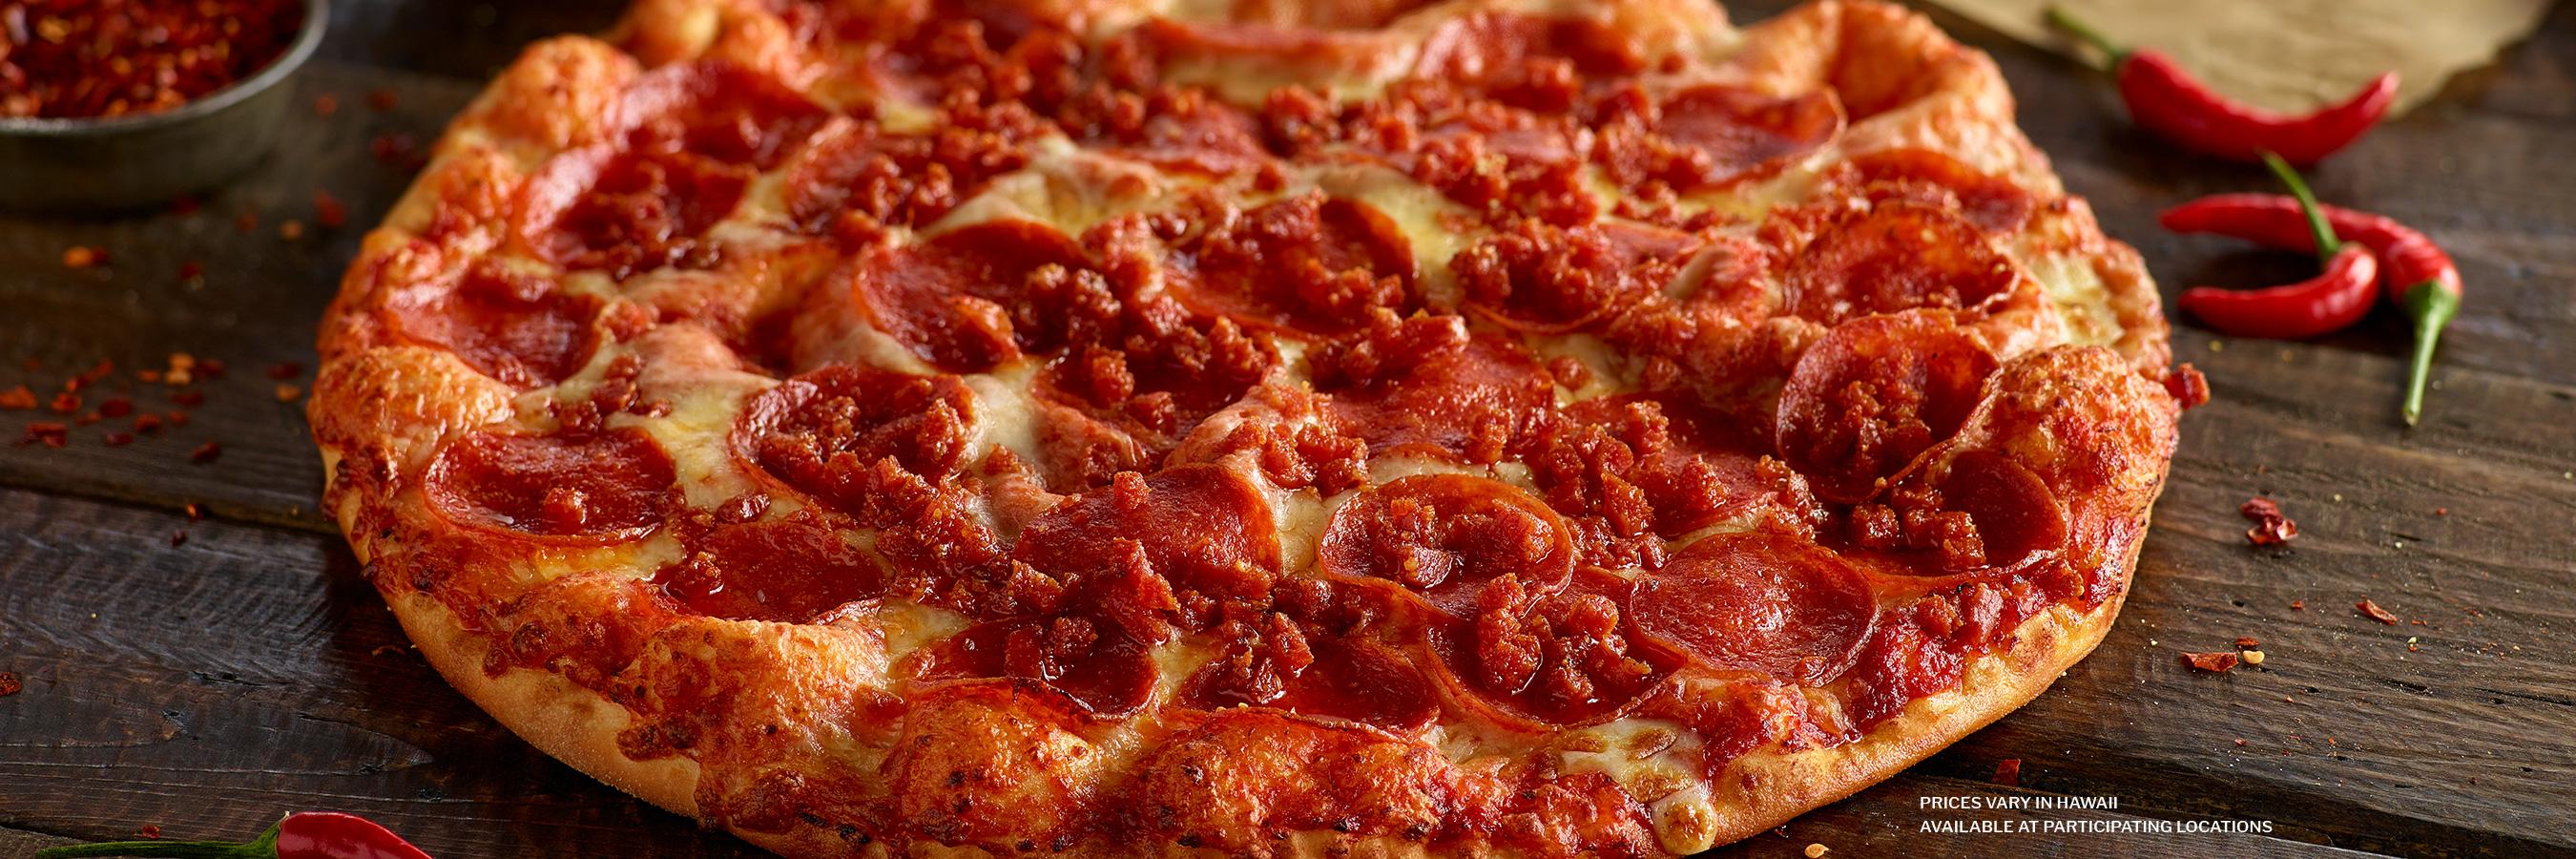 Shakey's Hero Image - Spicy Pepperoni Pizza